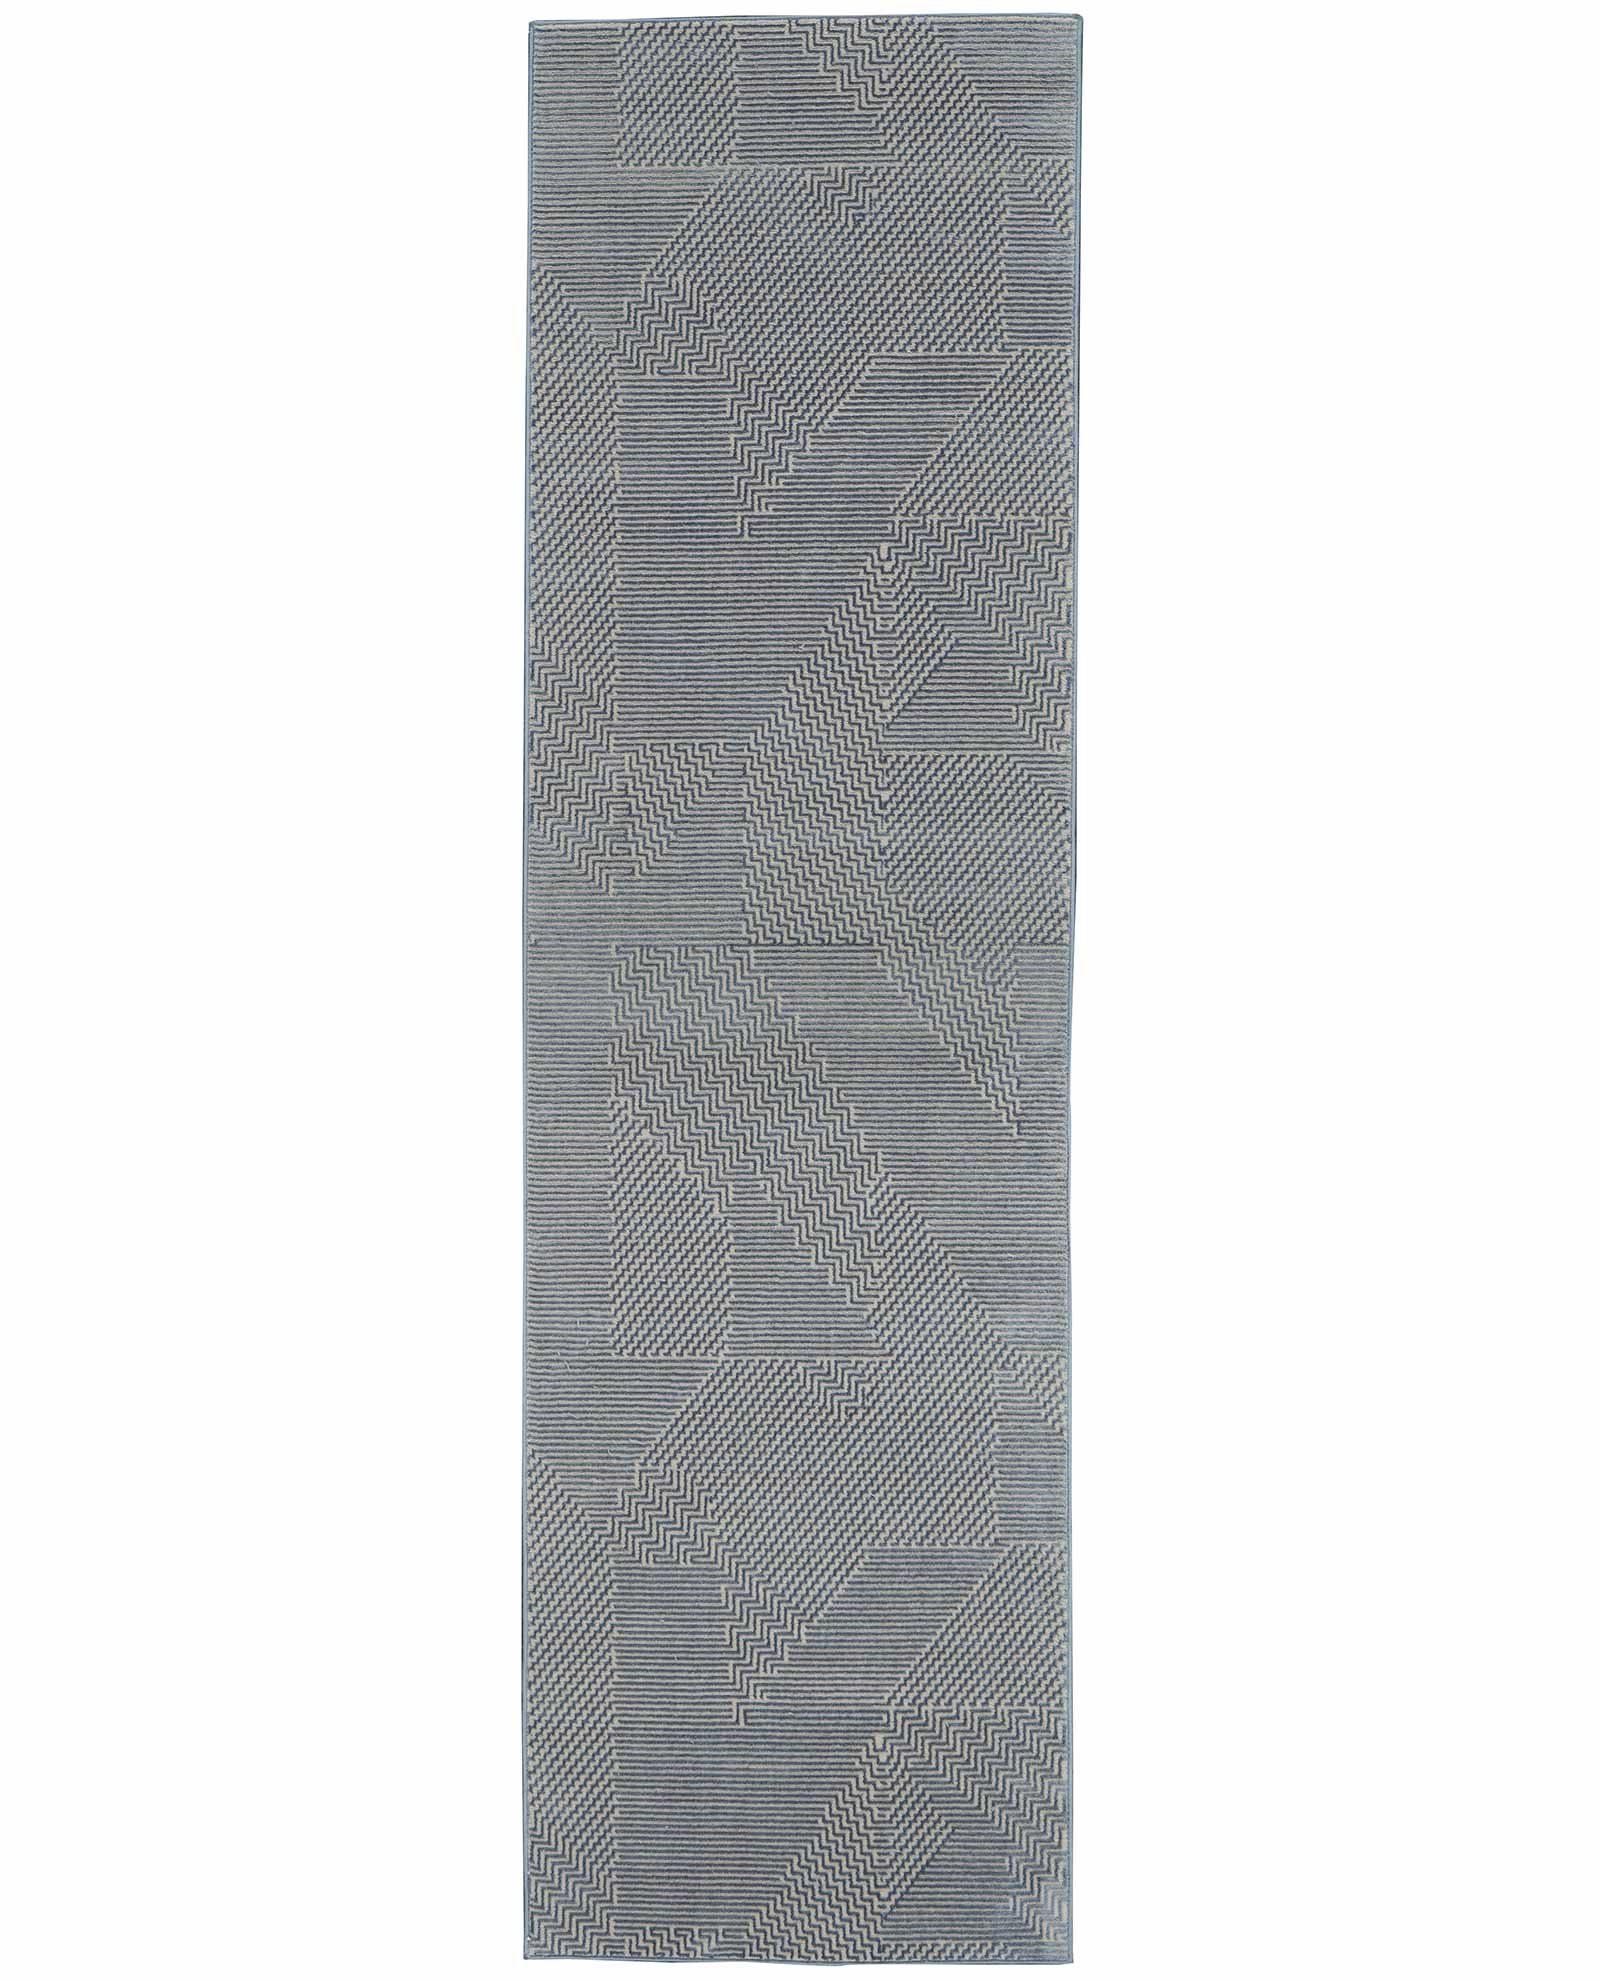 Calvin Klein rug Orlando CK850 CK852 GREY BLUE 2x8 099446488169 flat